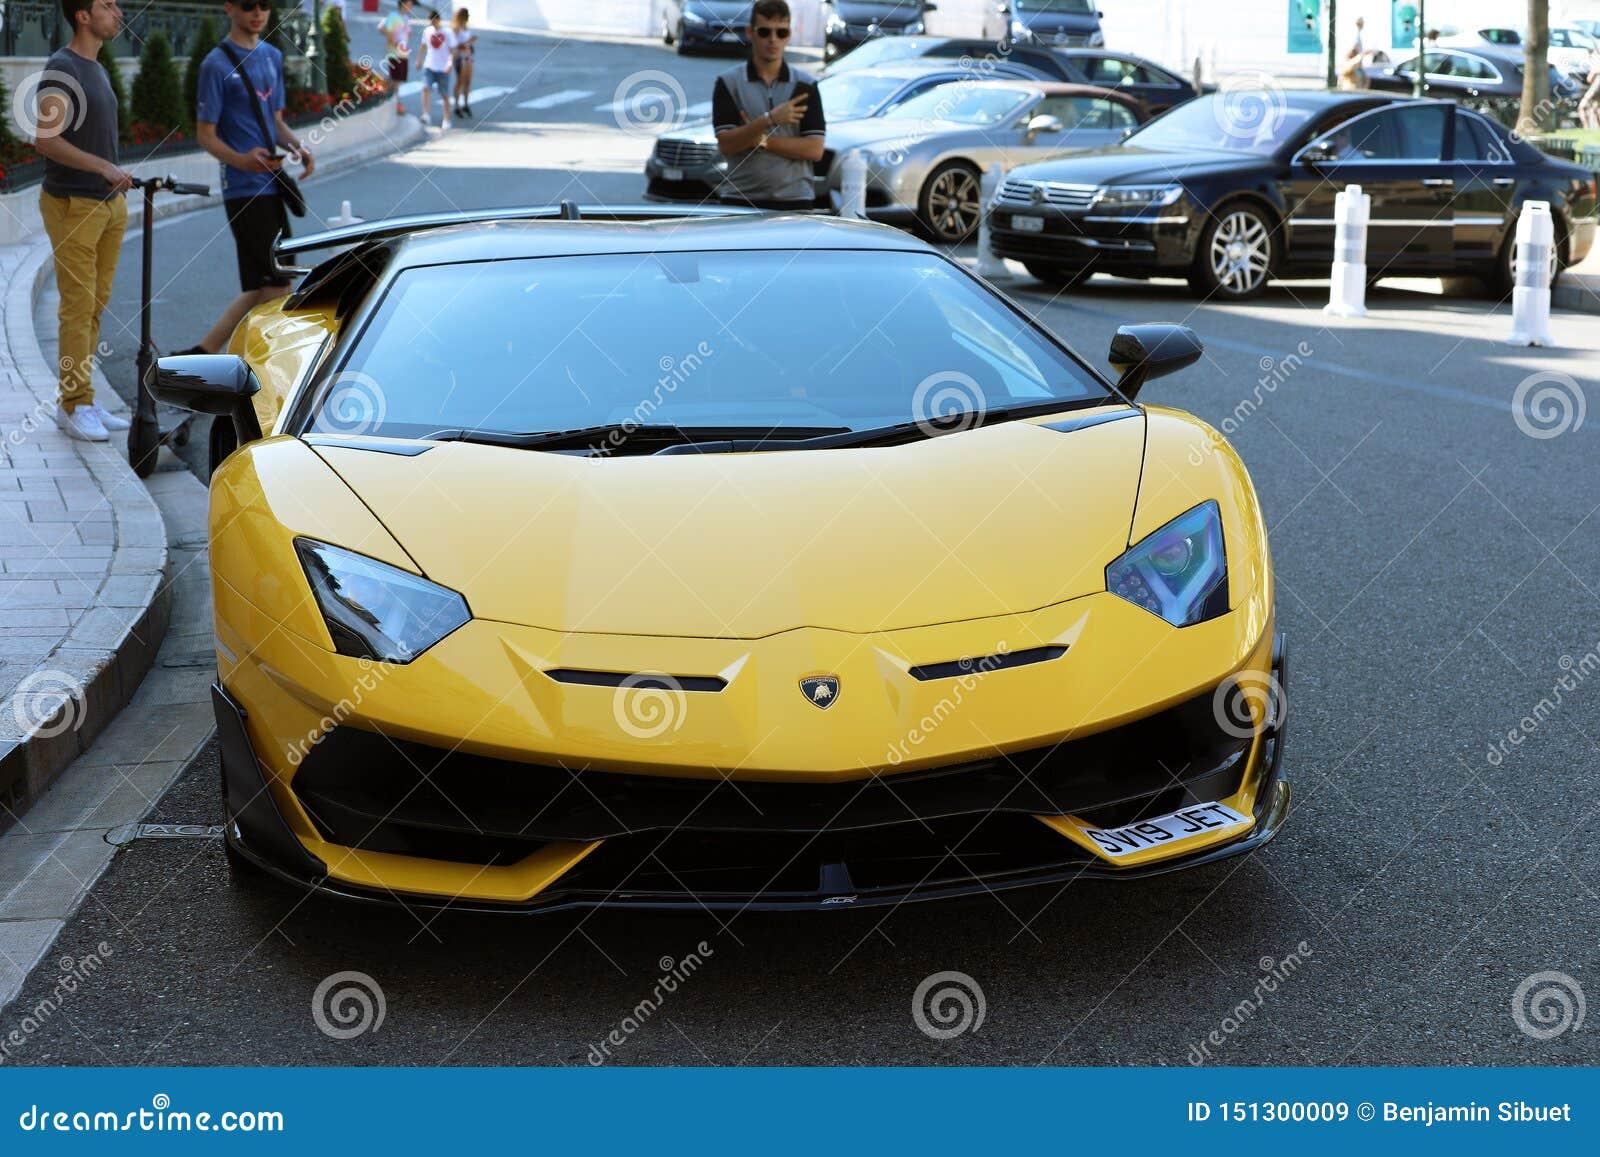 Black And Yellow Lamborghini SVJ , Front View Editorial